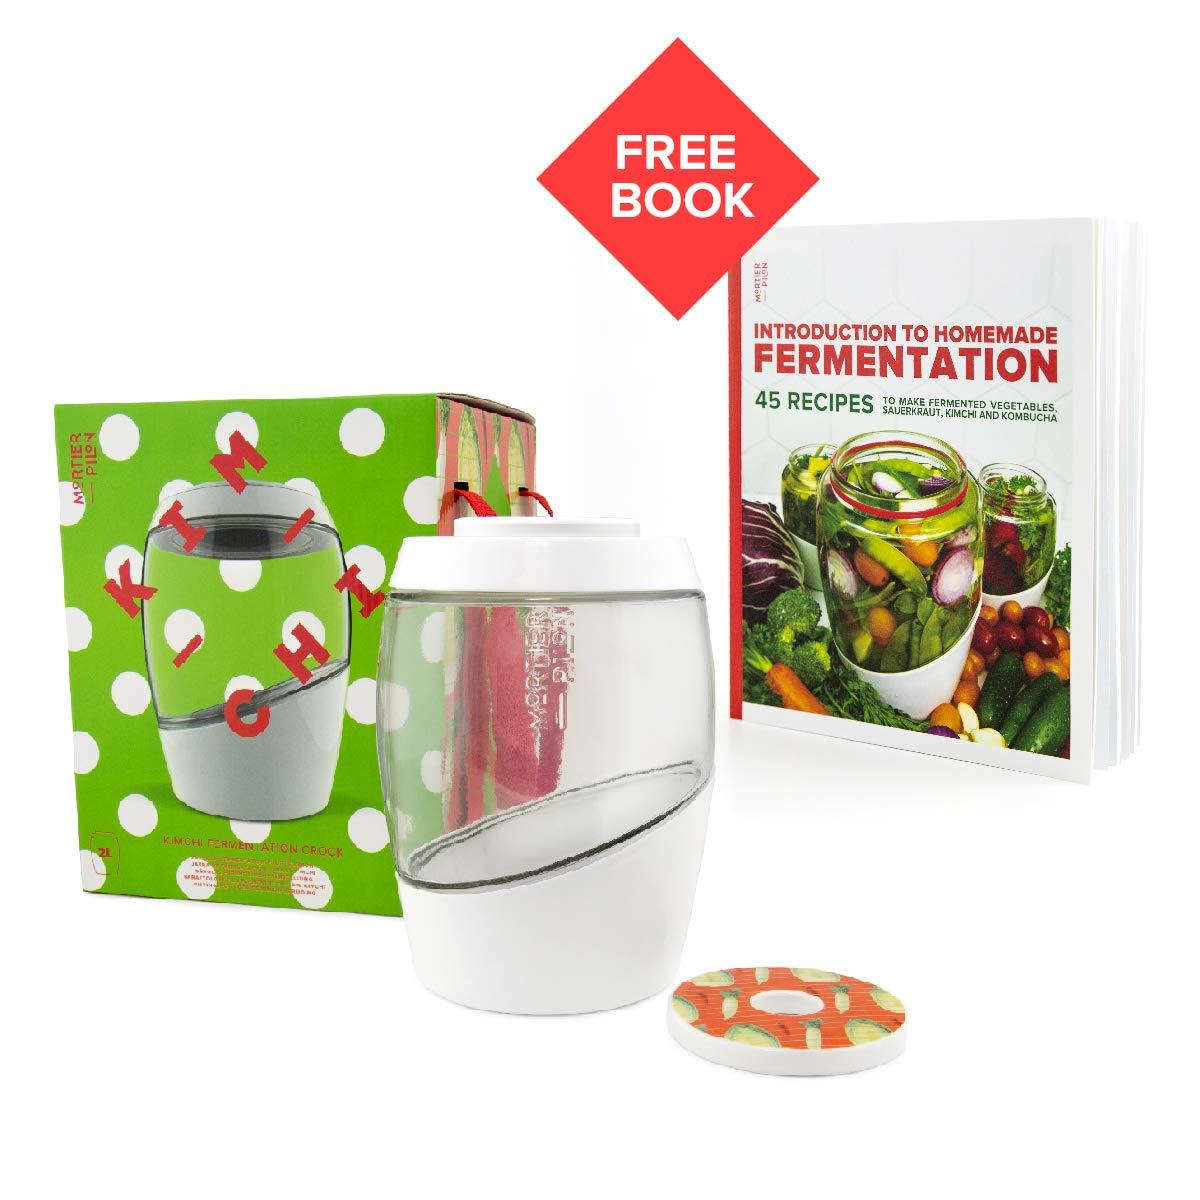 Mortier Pilon – 2L Kimchi Fermentation Crock + Free Recipe Book – Make Easy Homemade Fermented Foods (Kimchi, Pickles, Sauerkraut, Organic Vegetables)